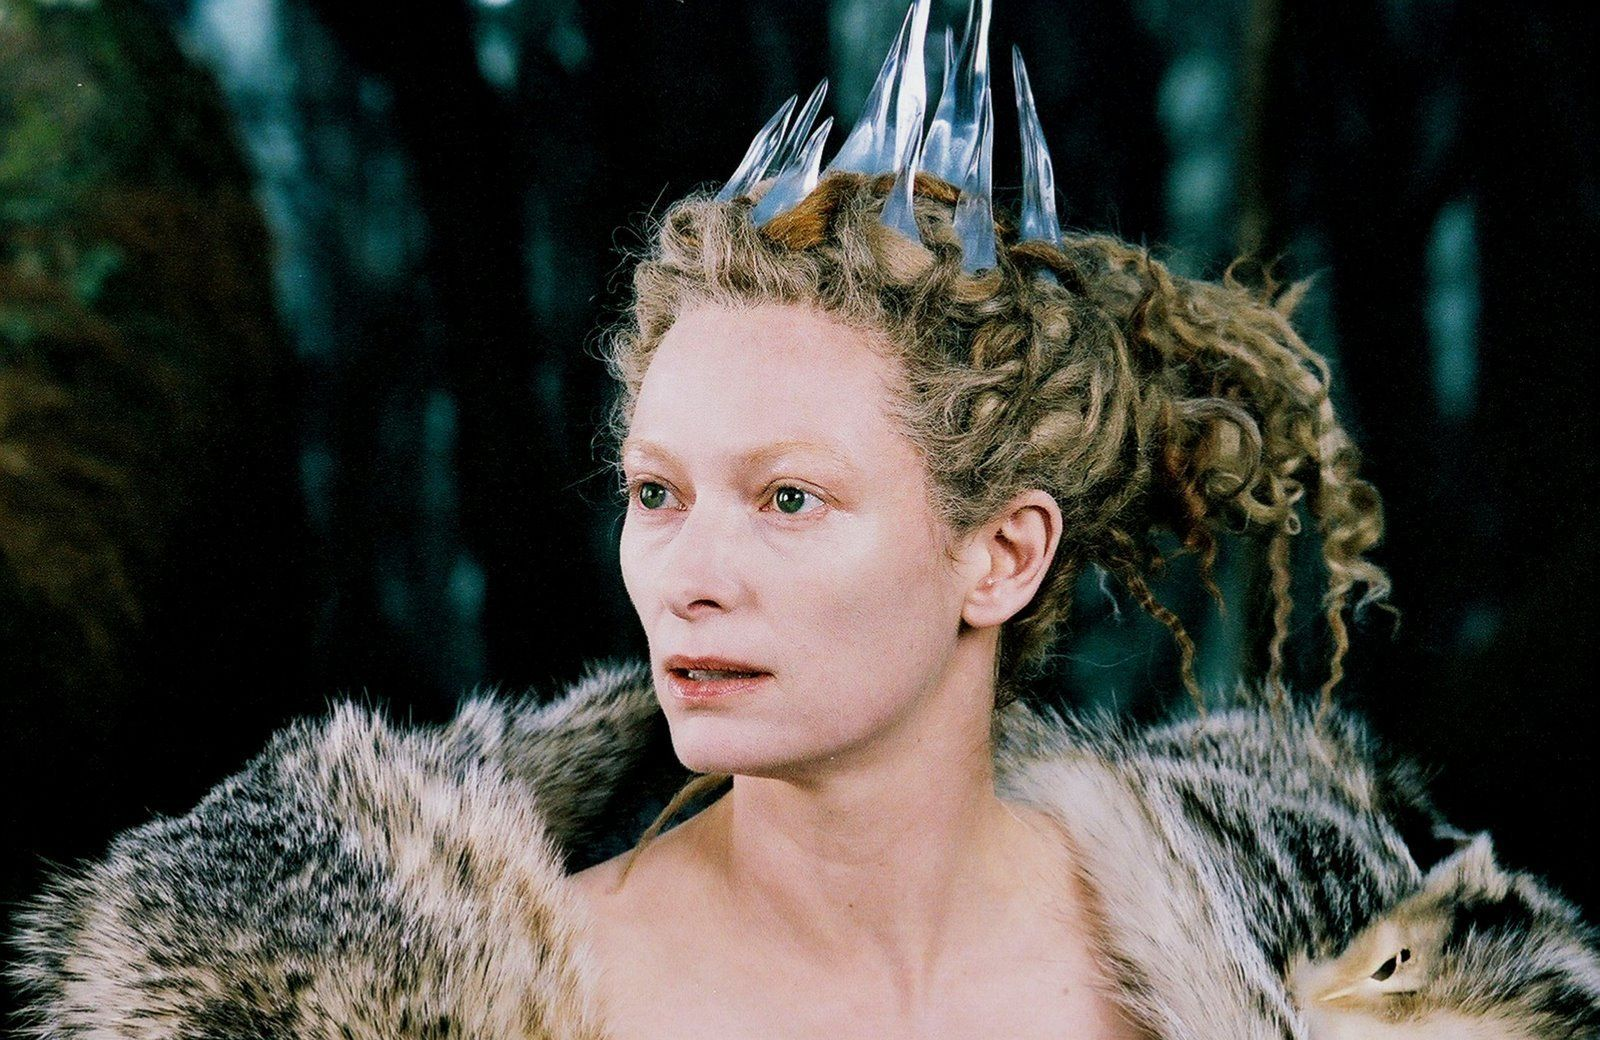 Jadis the White Witch\